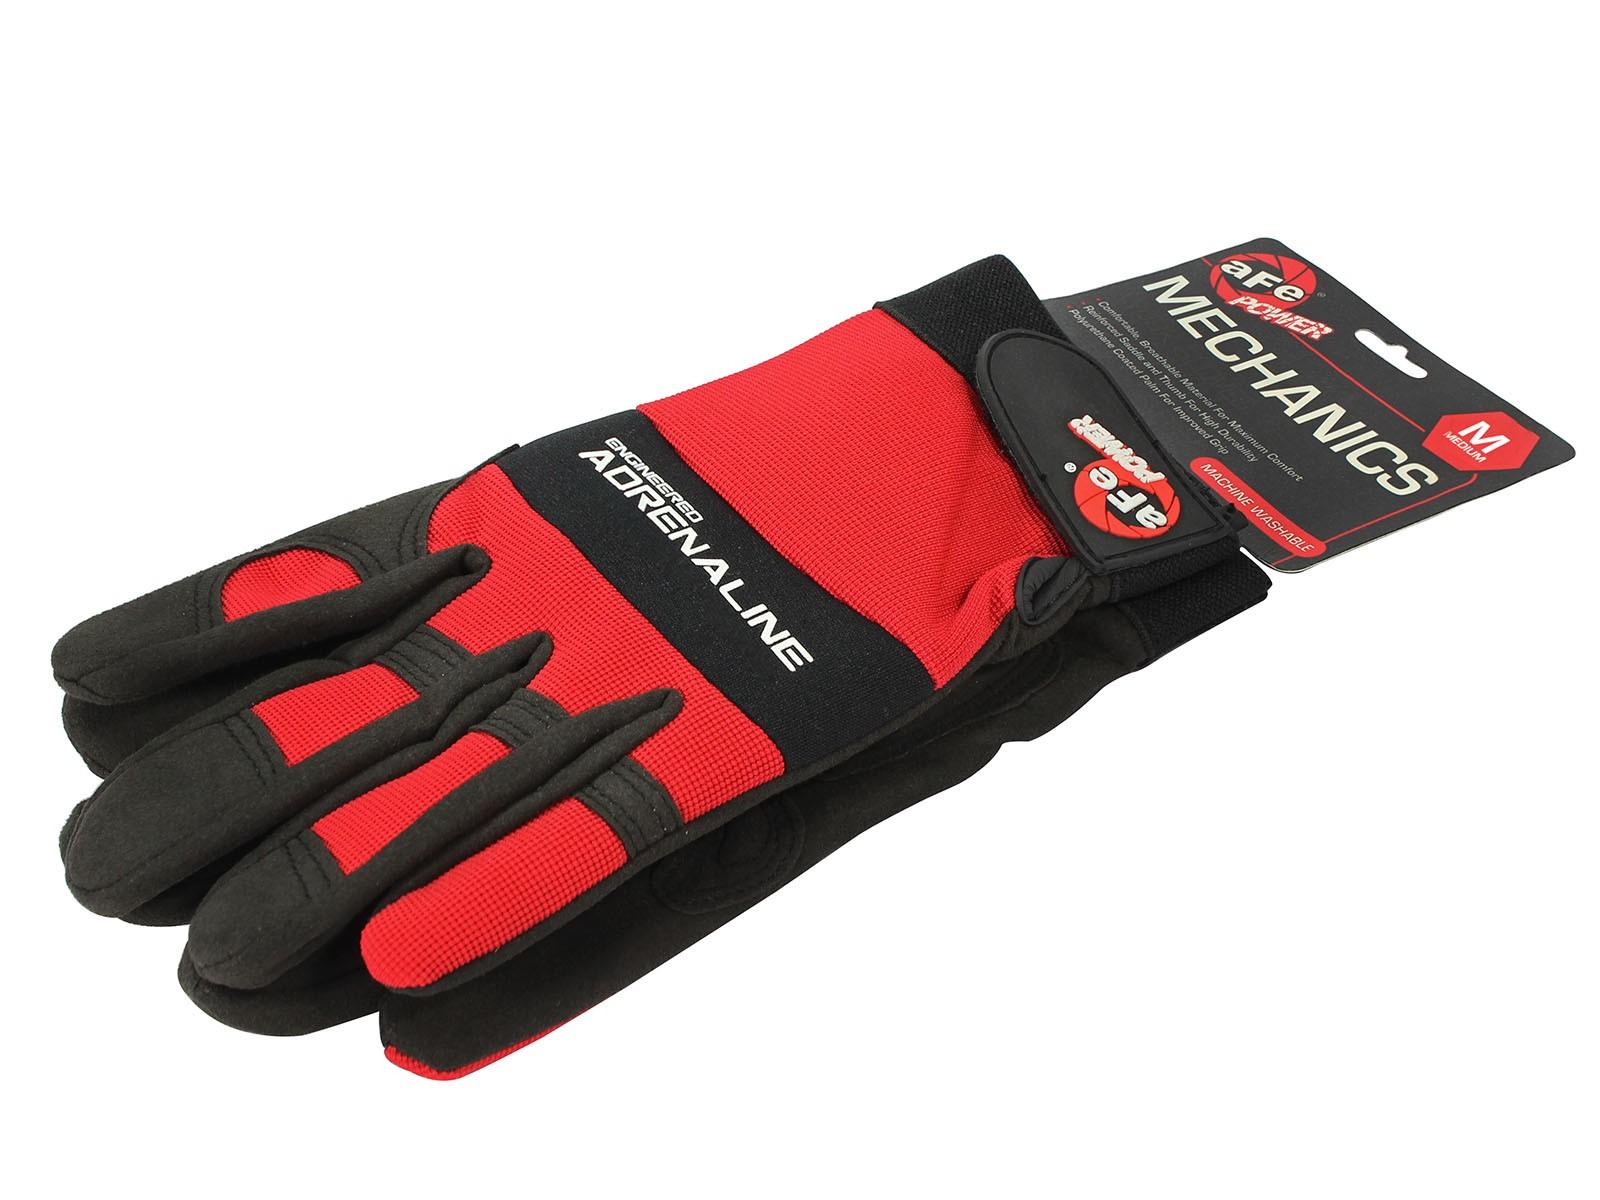 aFe POWER 40-10148 Apparel; Mechanics Gloves (M)